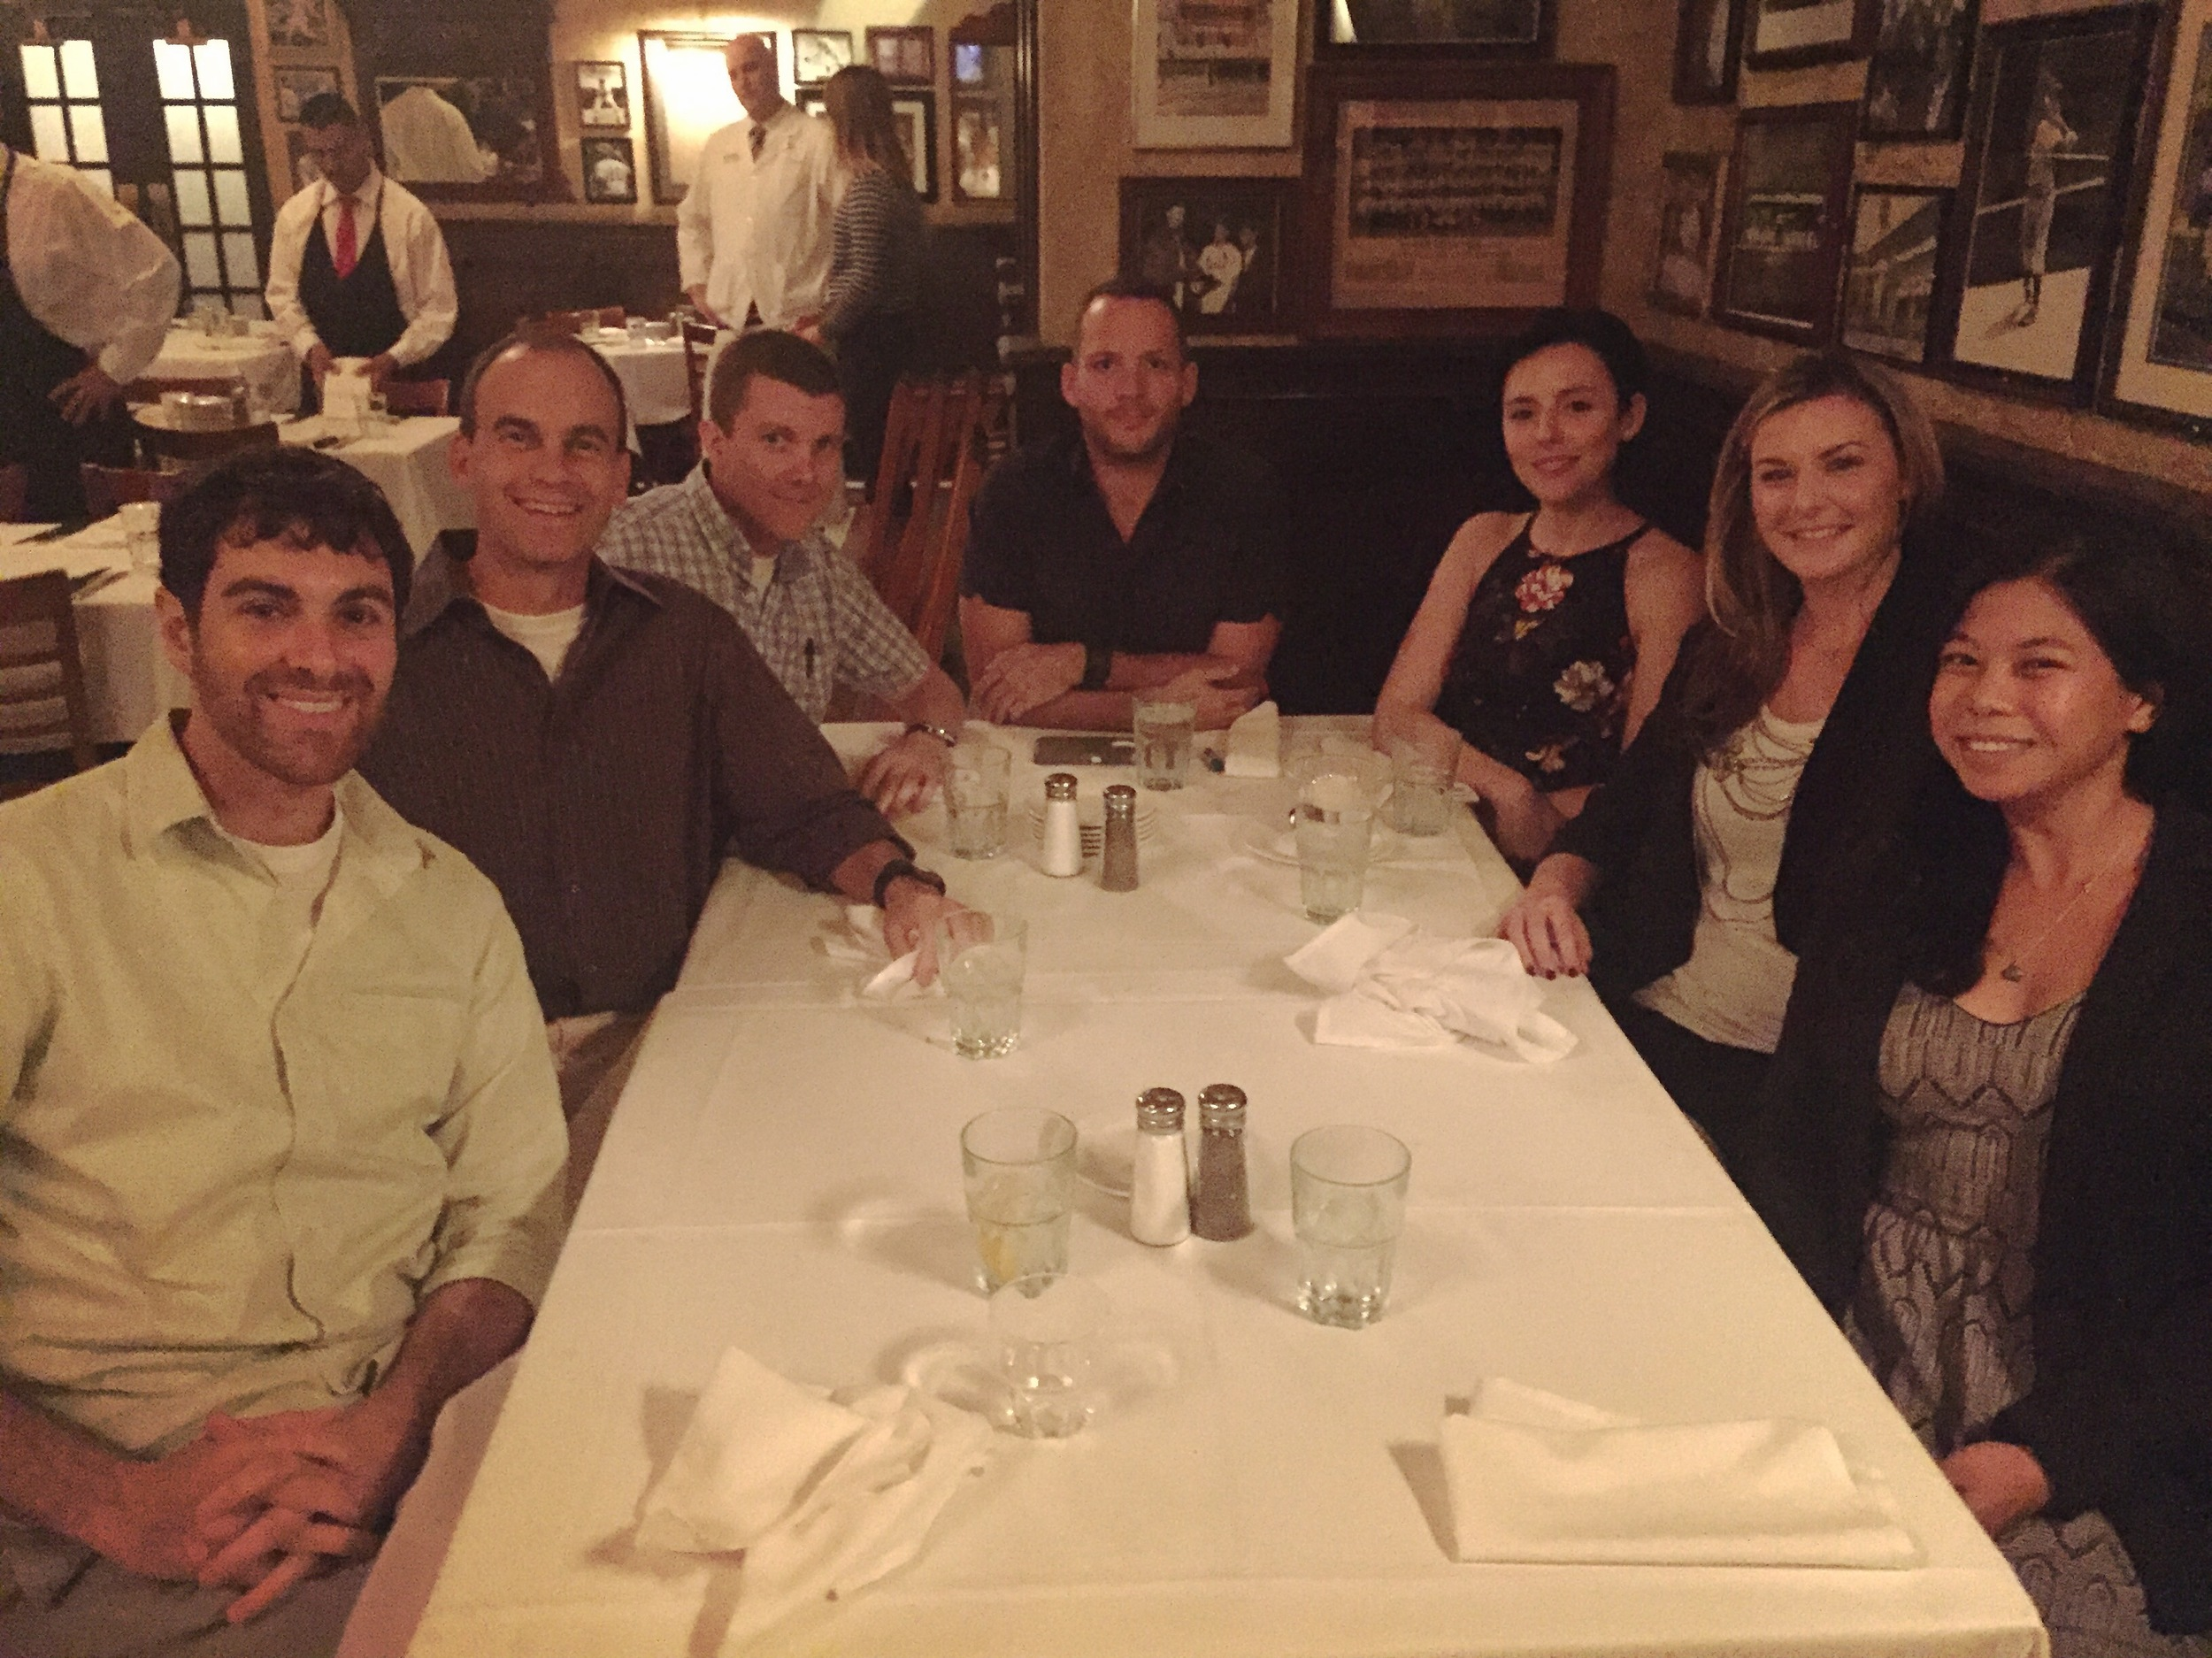 Kinney Lab dinner reunion (left to right): Dr. Sabbagh, Dr. Kinney, Michael Langhardt, Andrew Murtishaw, Kirsten Calvin, Monica Bolton, Christy Magcalas.